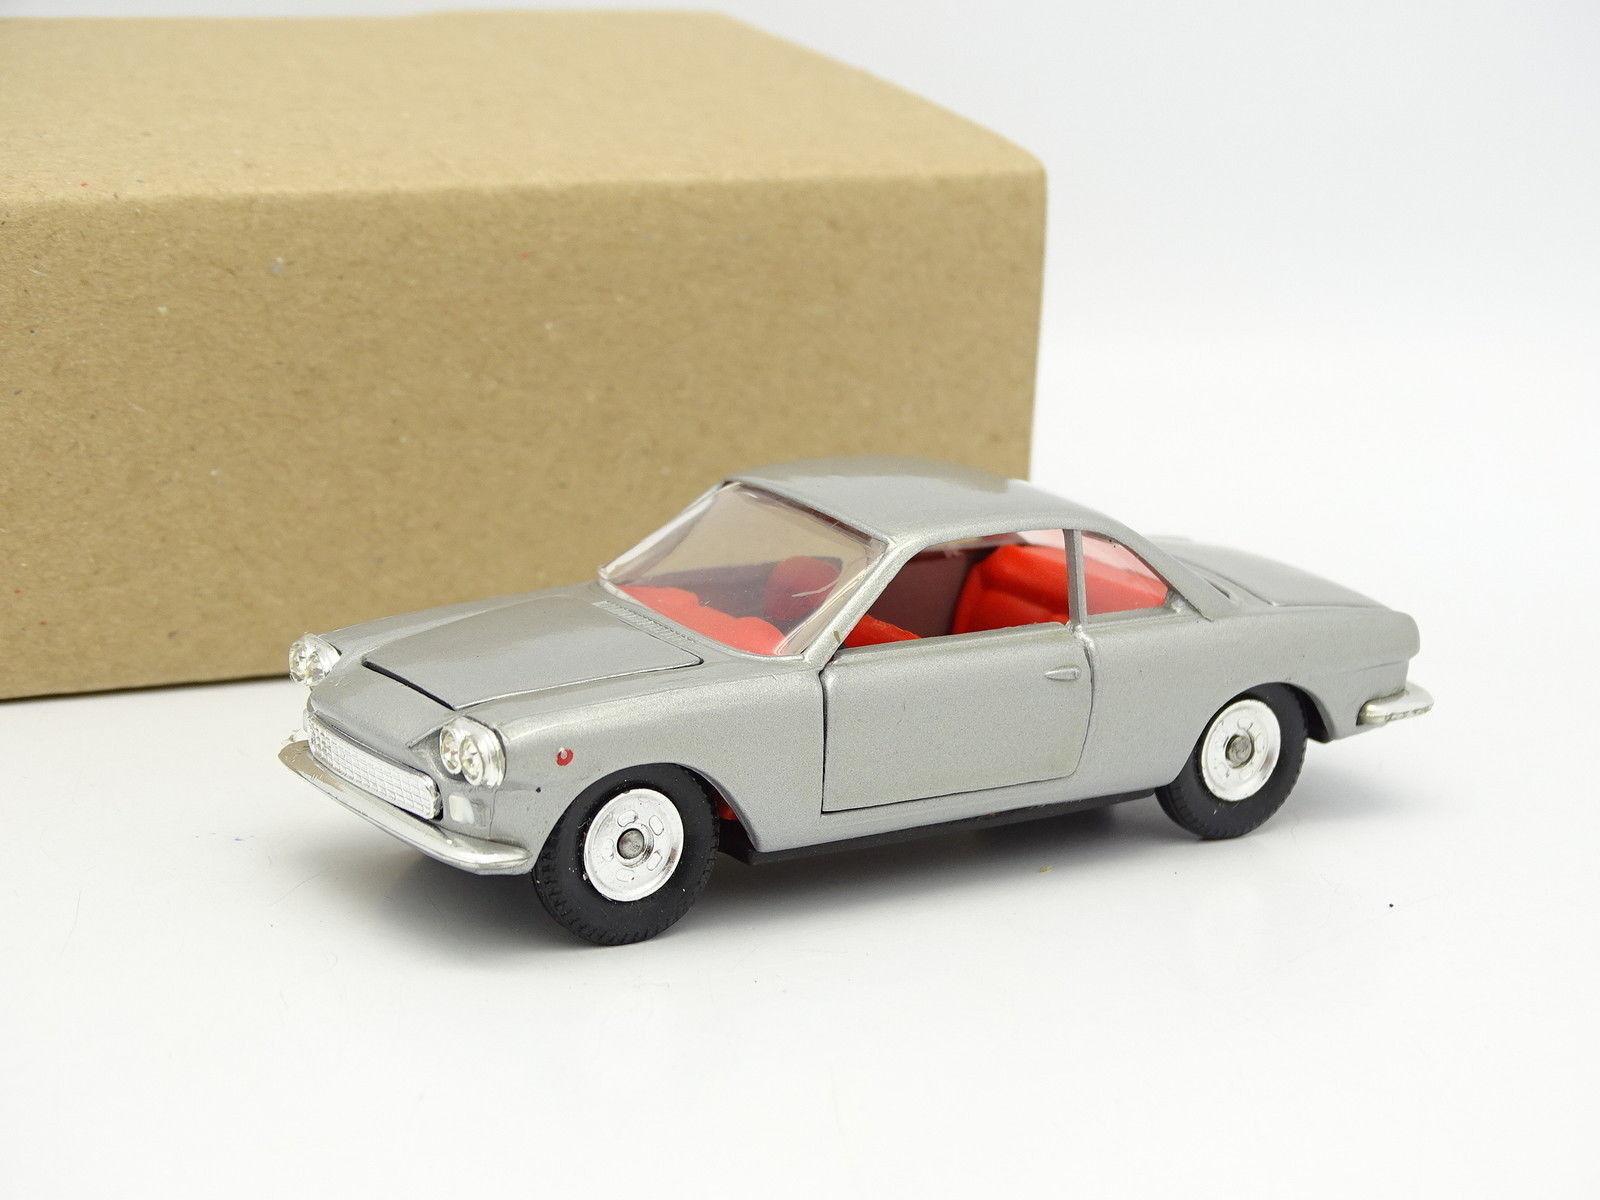 PoliJuguetes 1 43 - Fiat Siata 1500 gris 502